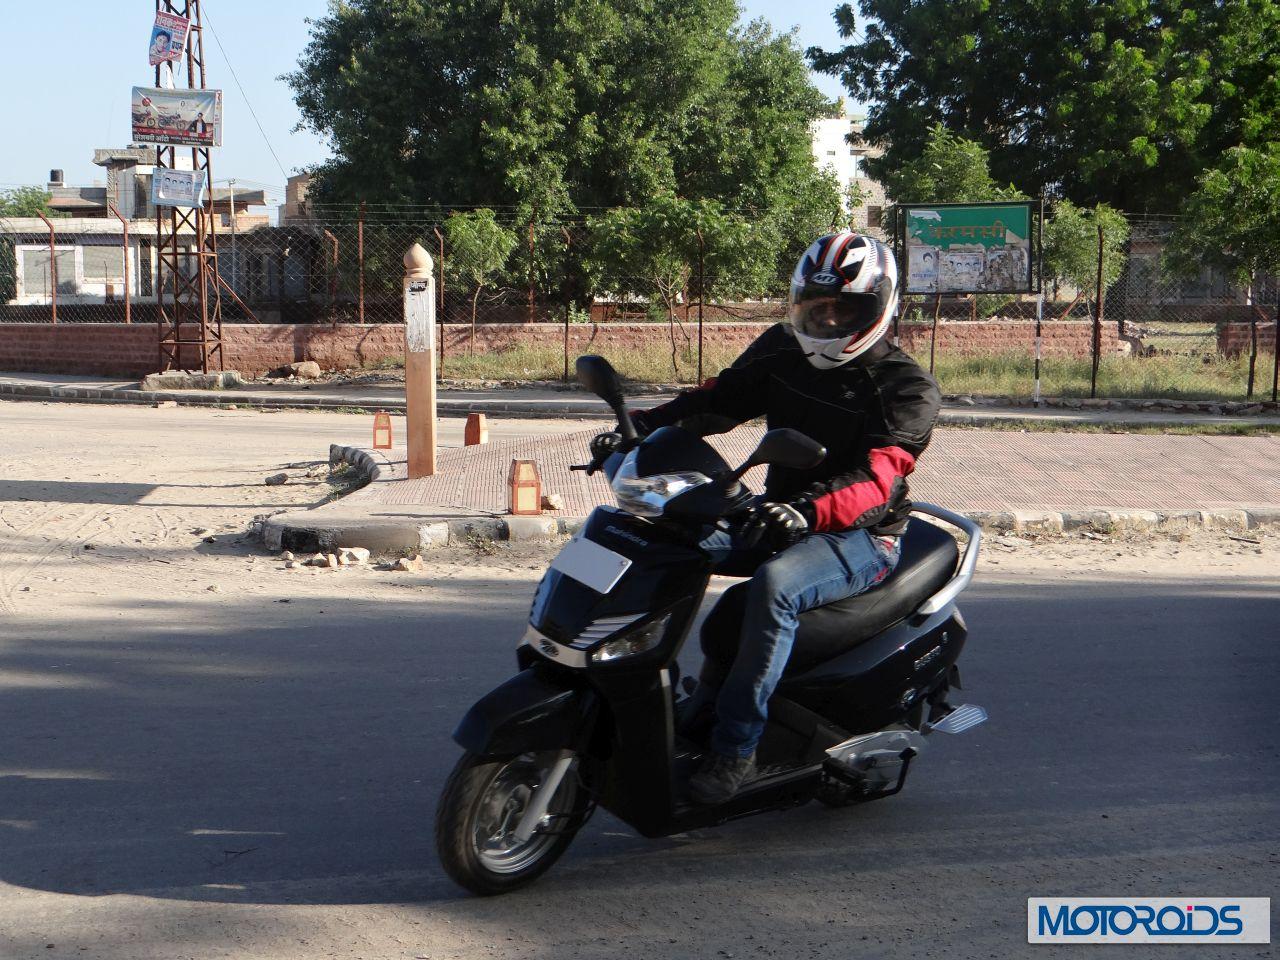 Mahindra Gusto scooter motion (2)